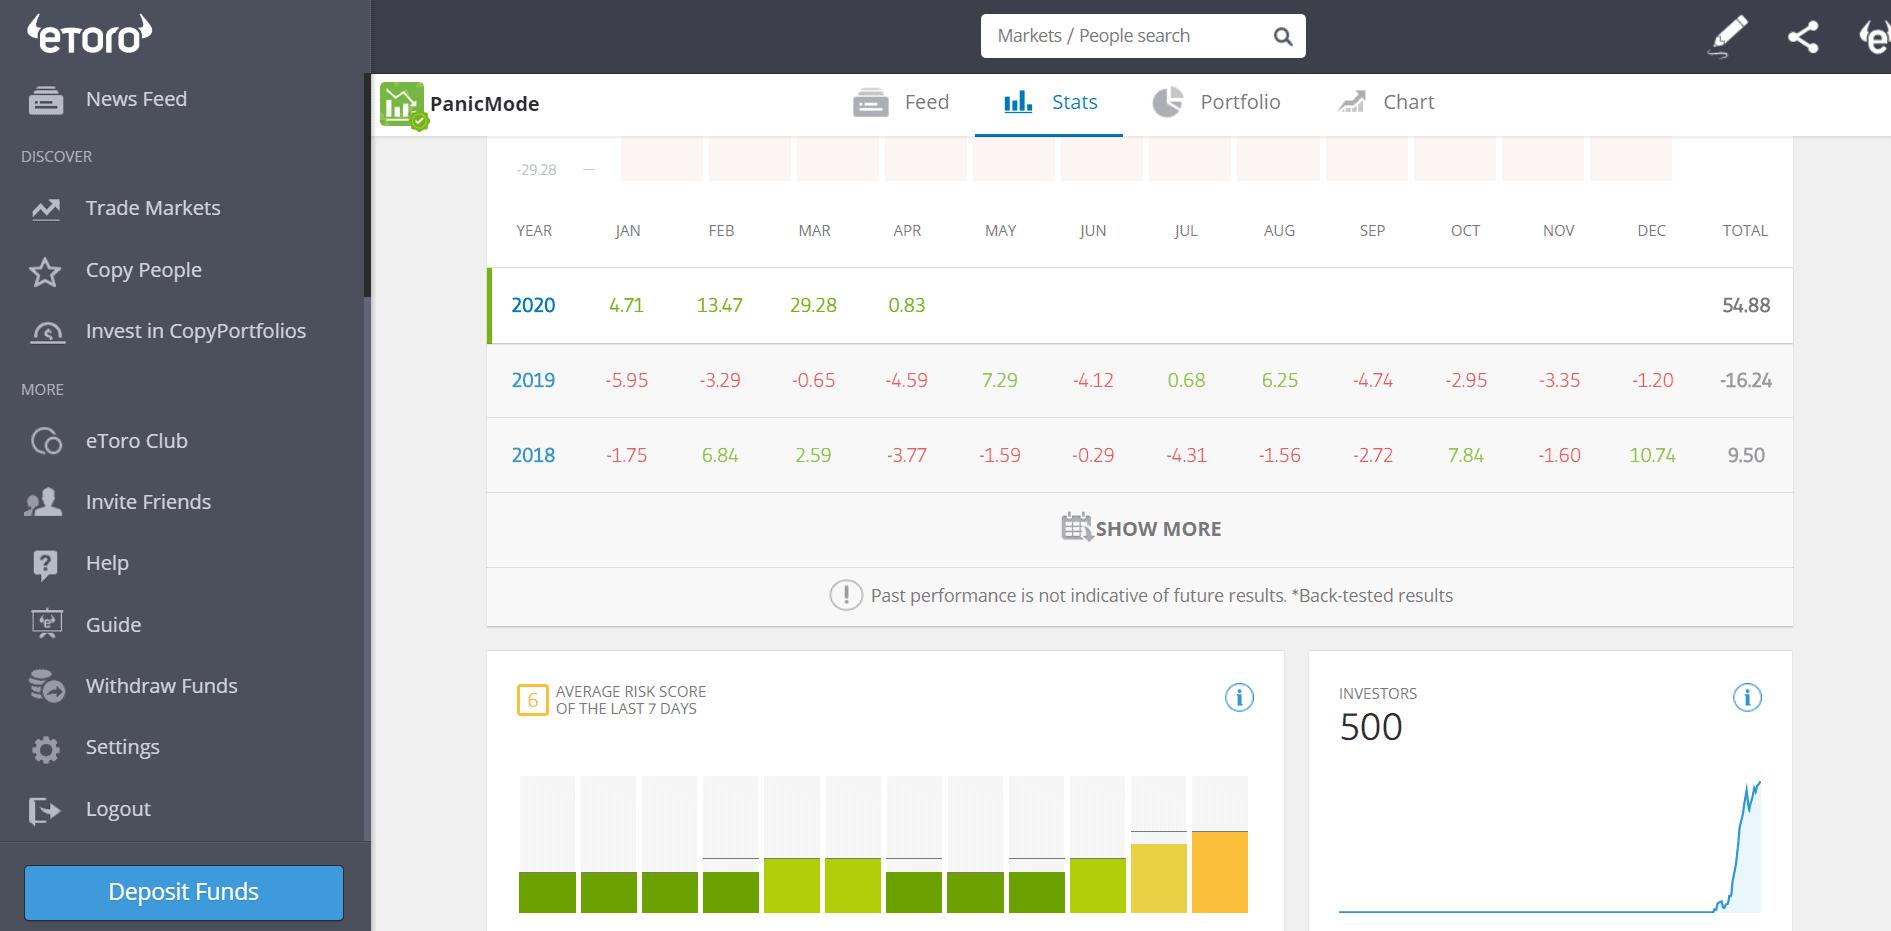 screengrab of eToro portfolio performance page